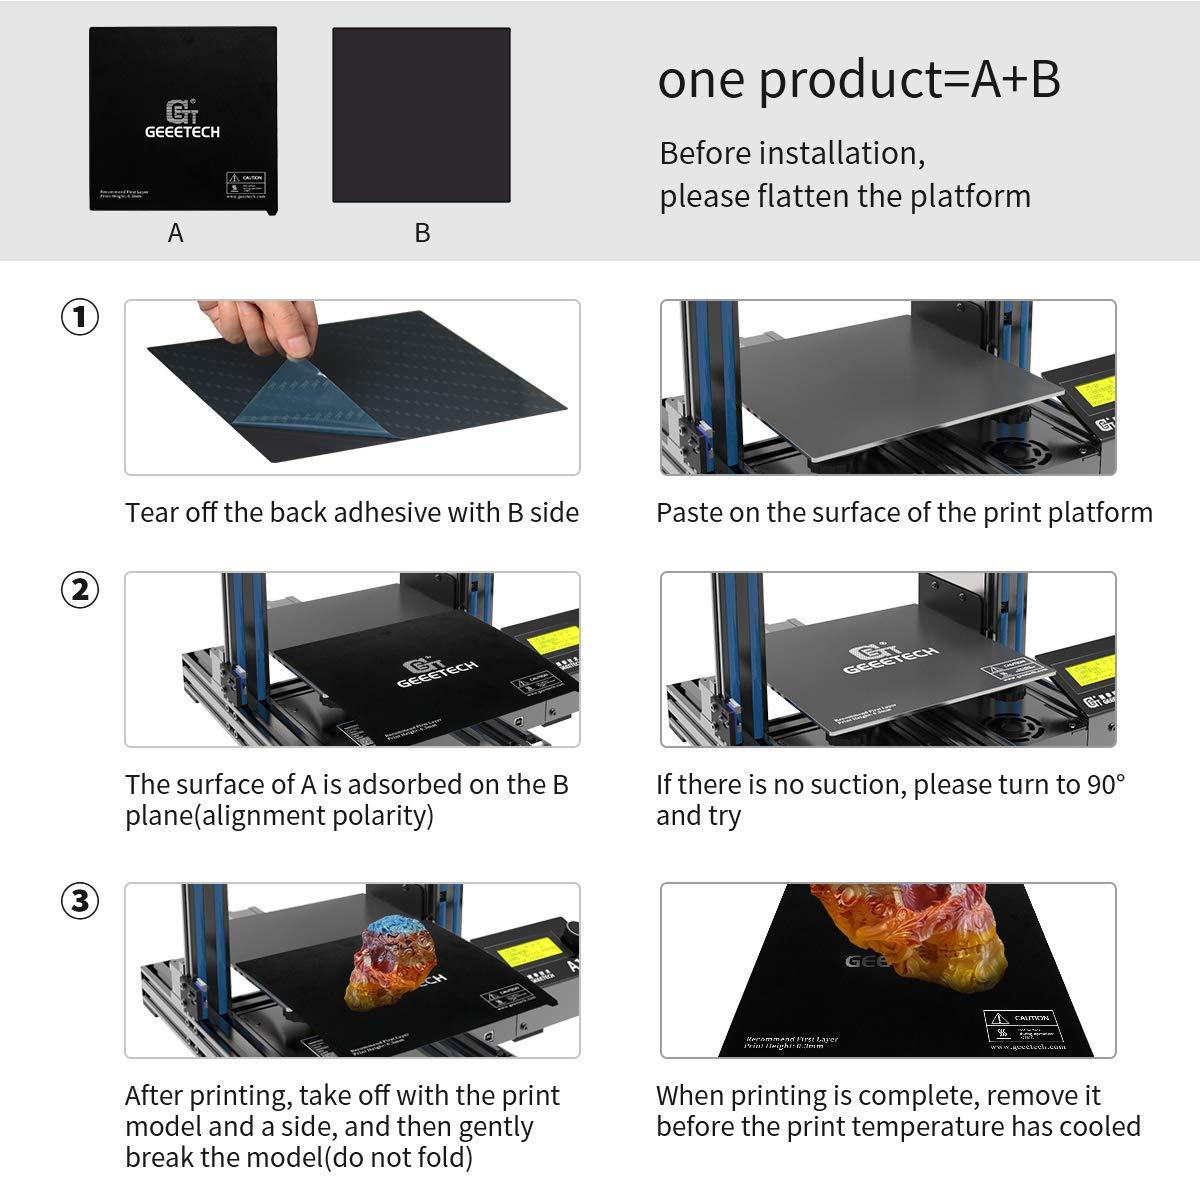 DERUC Impresora 3D placa magn/ética desmontable 3M adhesivo de doble cara A30 flexible